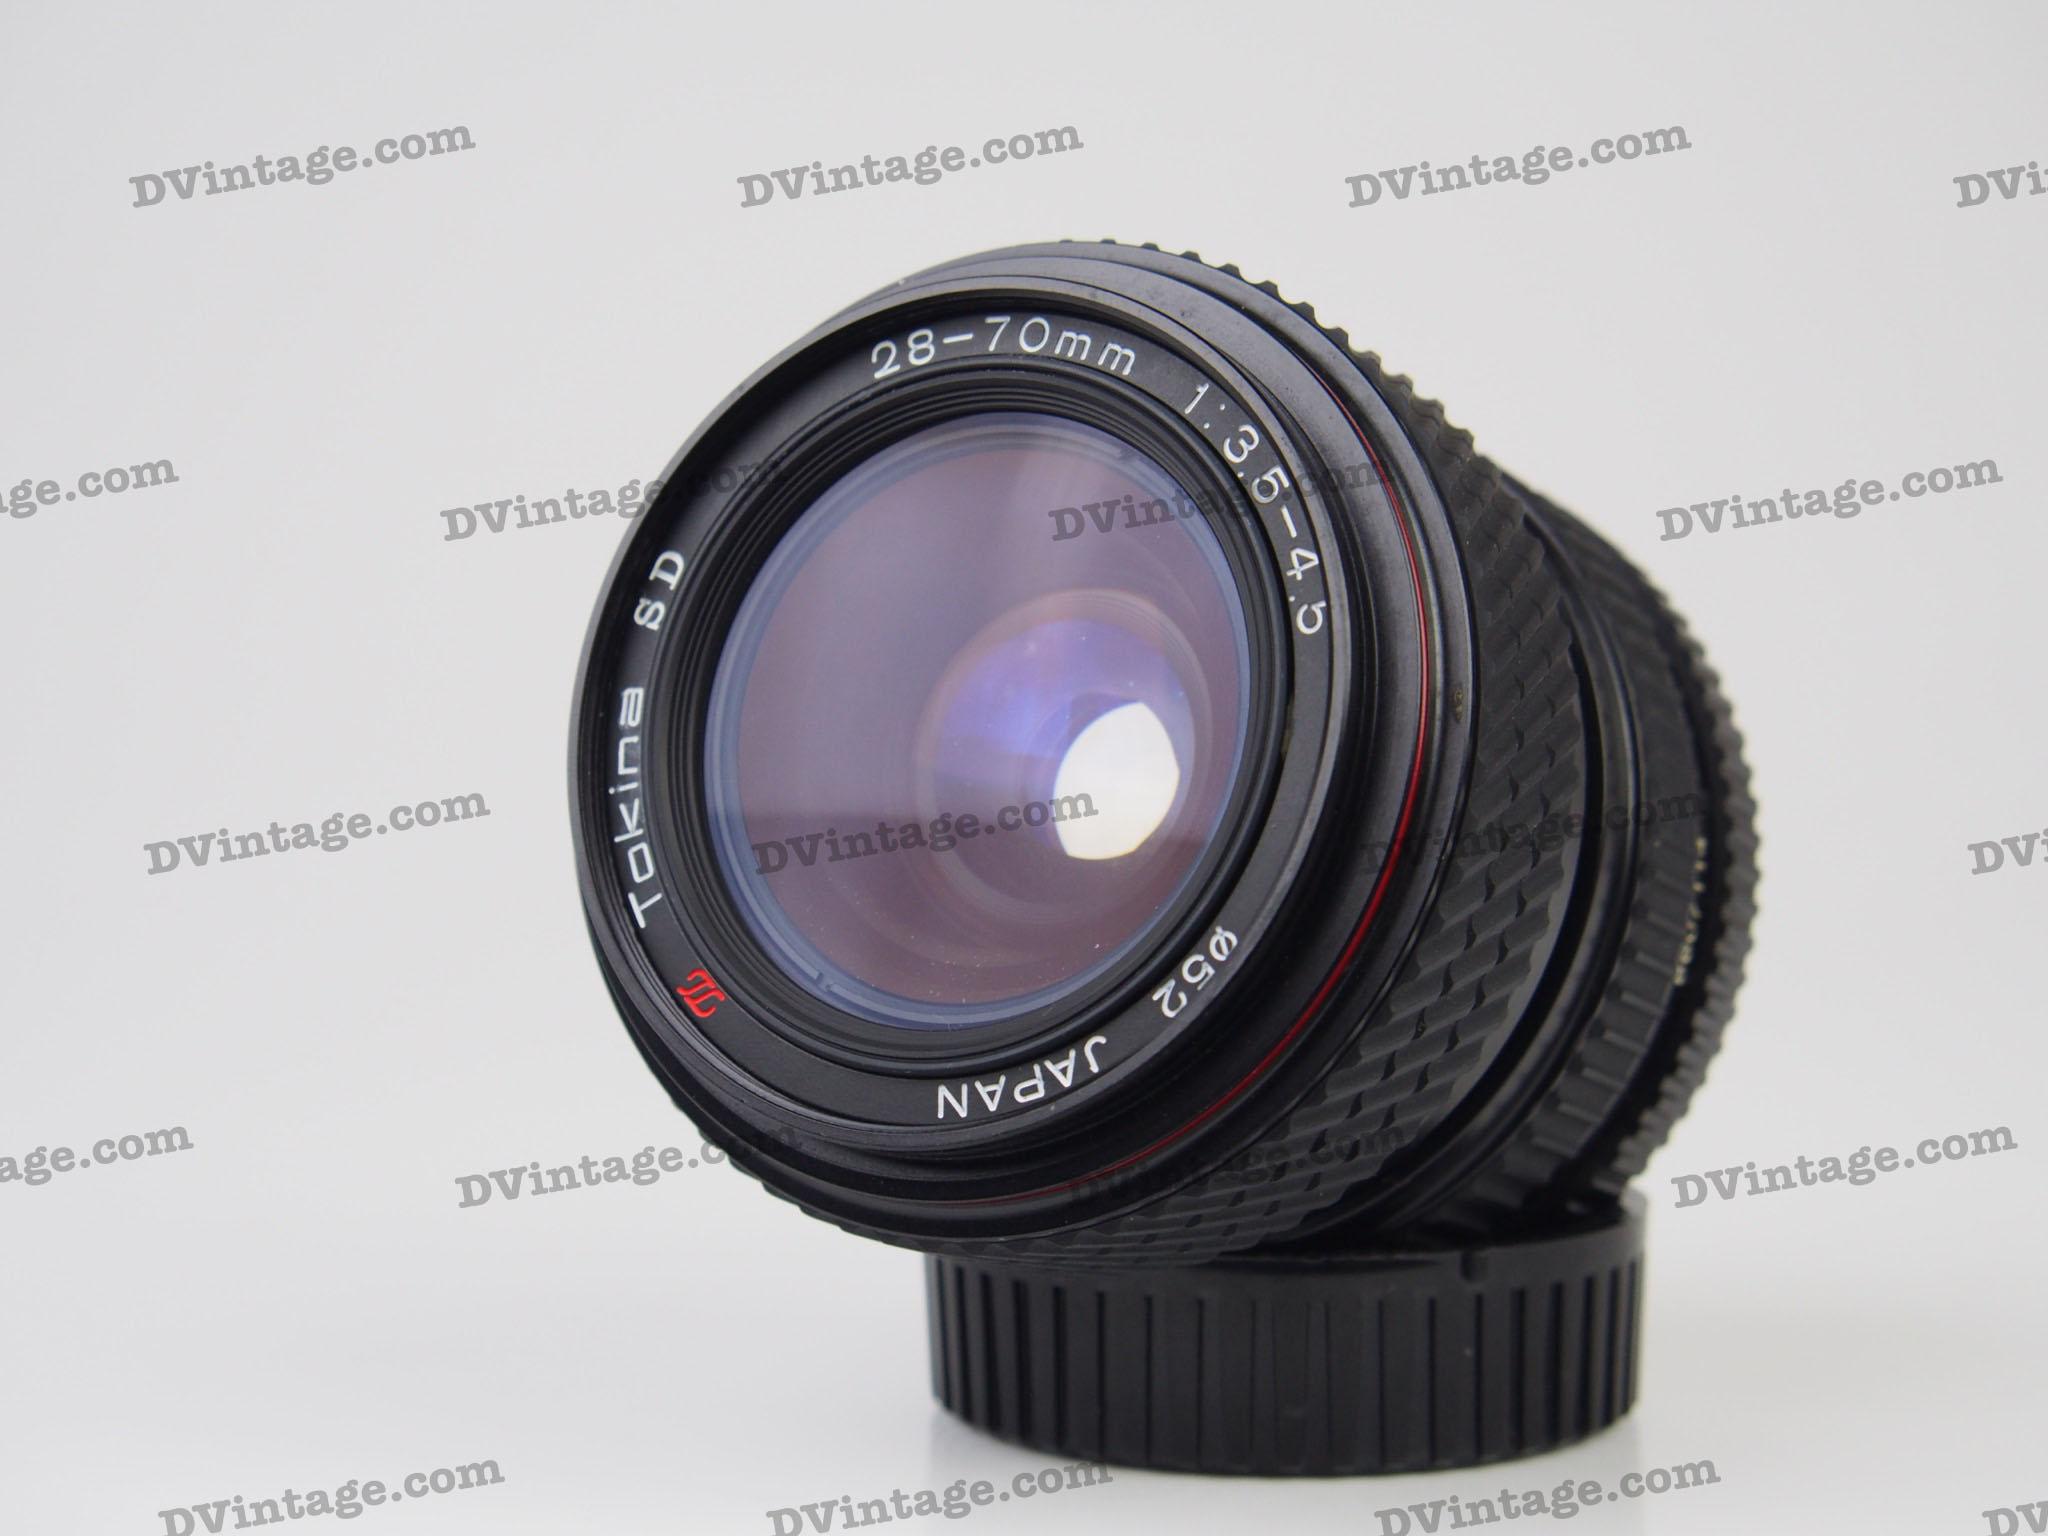 Sold Out ขายแล้วครับ 12/2/60 เลนส์ Tokina SD 28-70mm F3.5-4.5 OM Mount